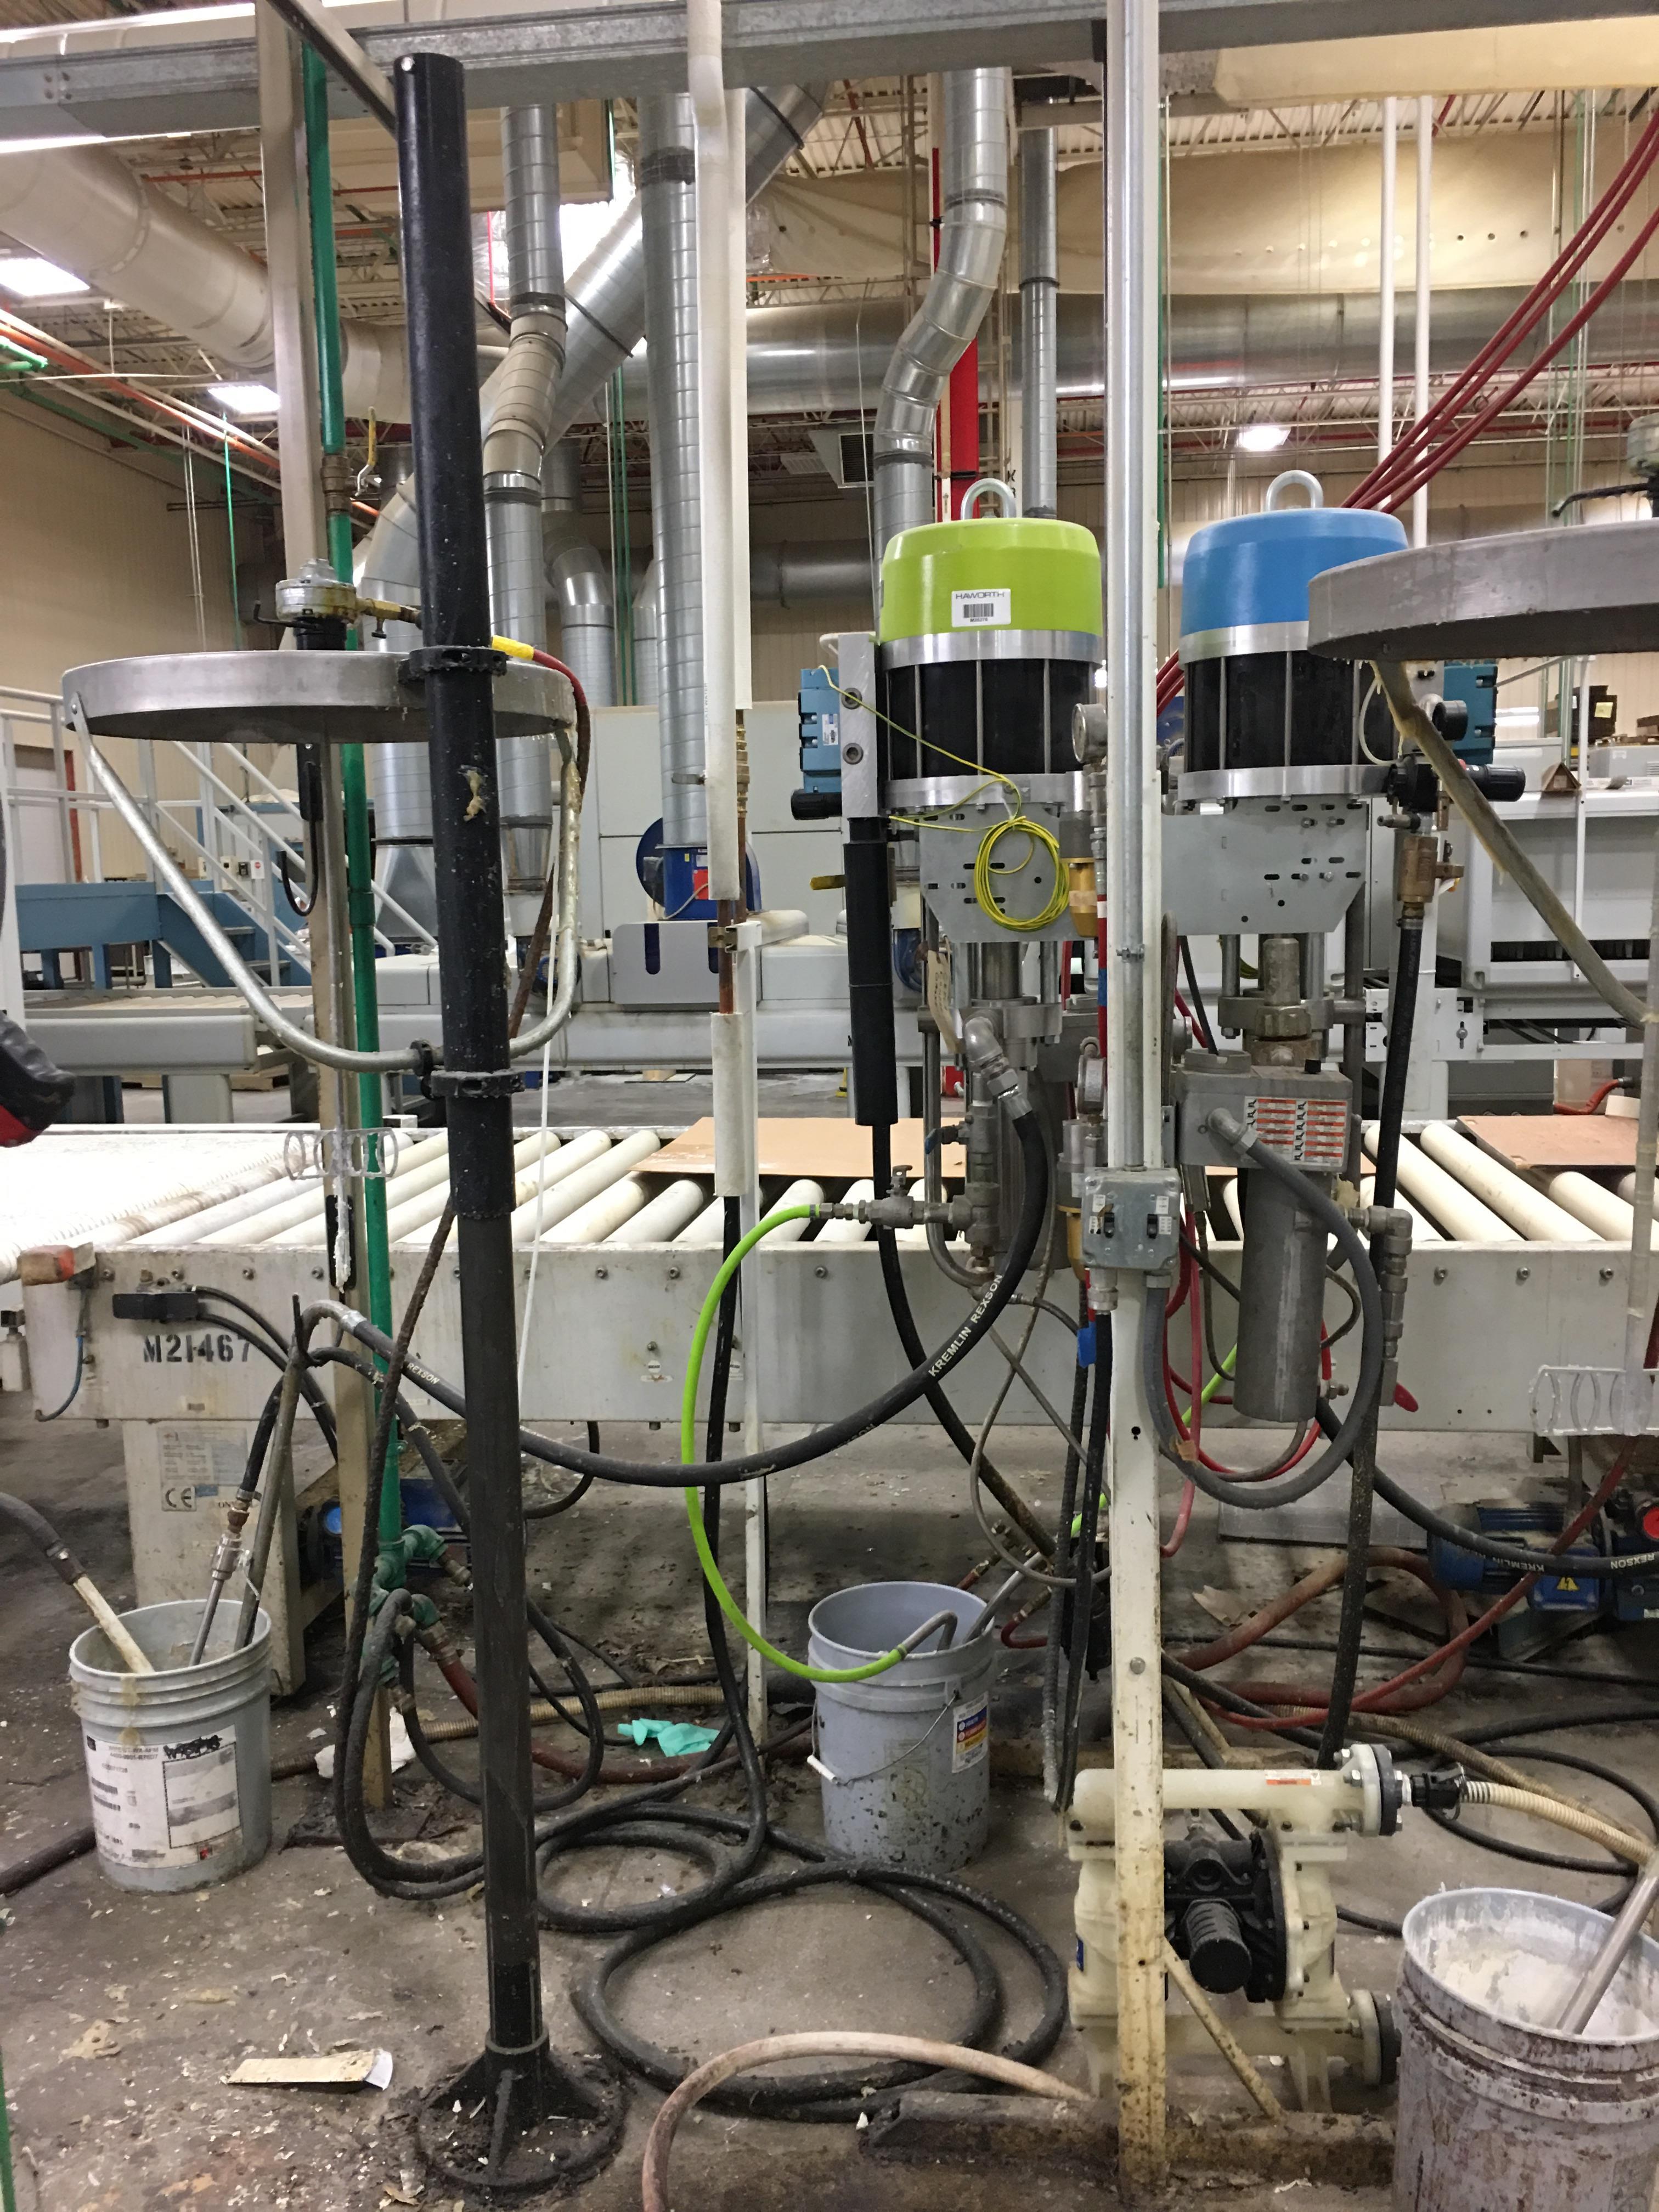 Lot of 3 Spray Pumps